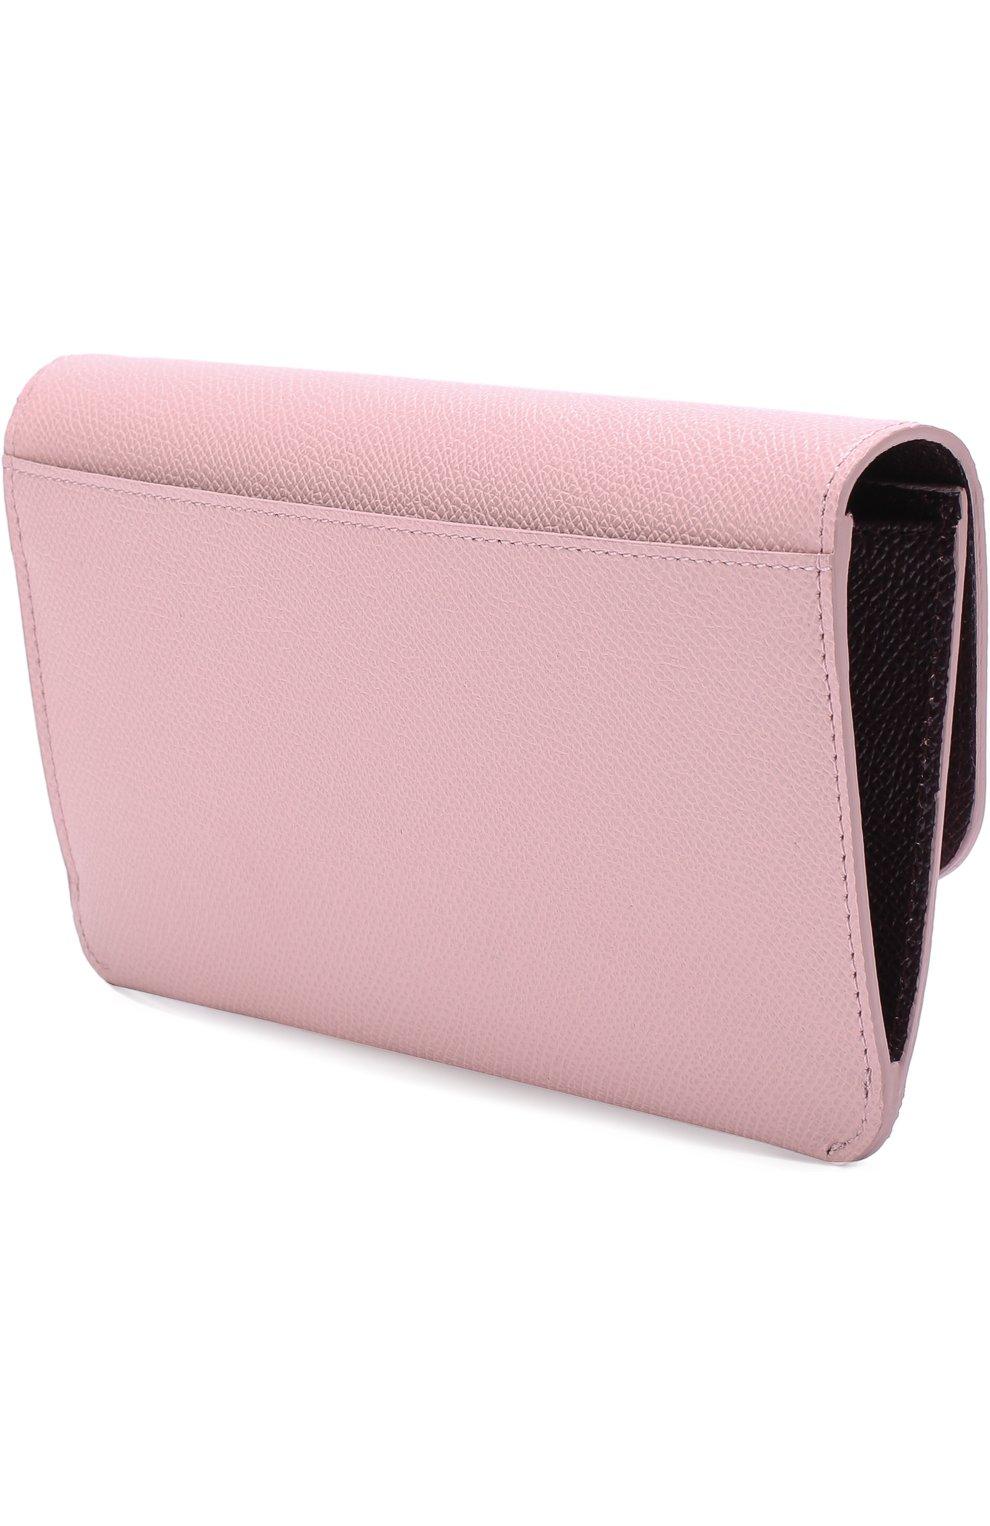 Набор из кожаного портмоне и футляров Dolce & Gabbana розового цвета | Фото №2